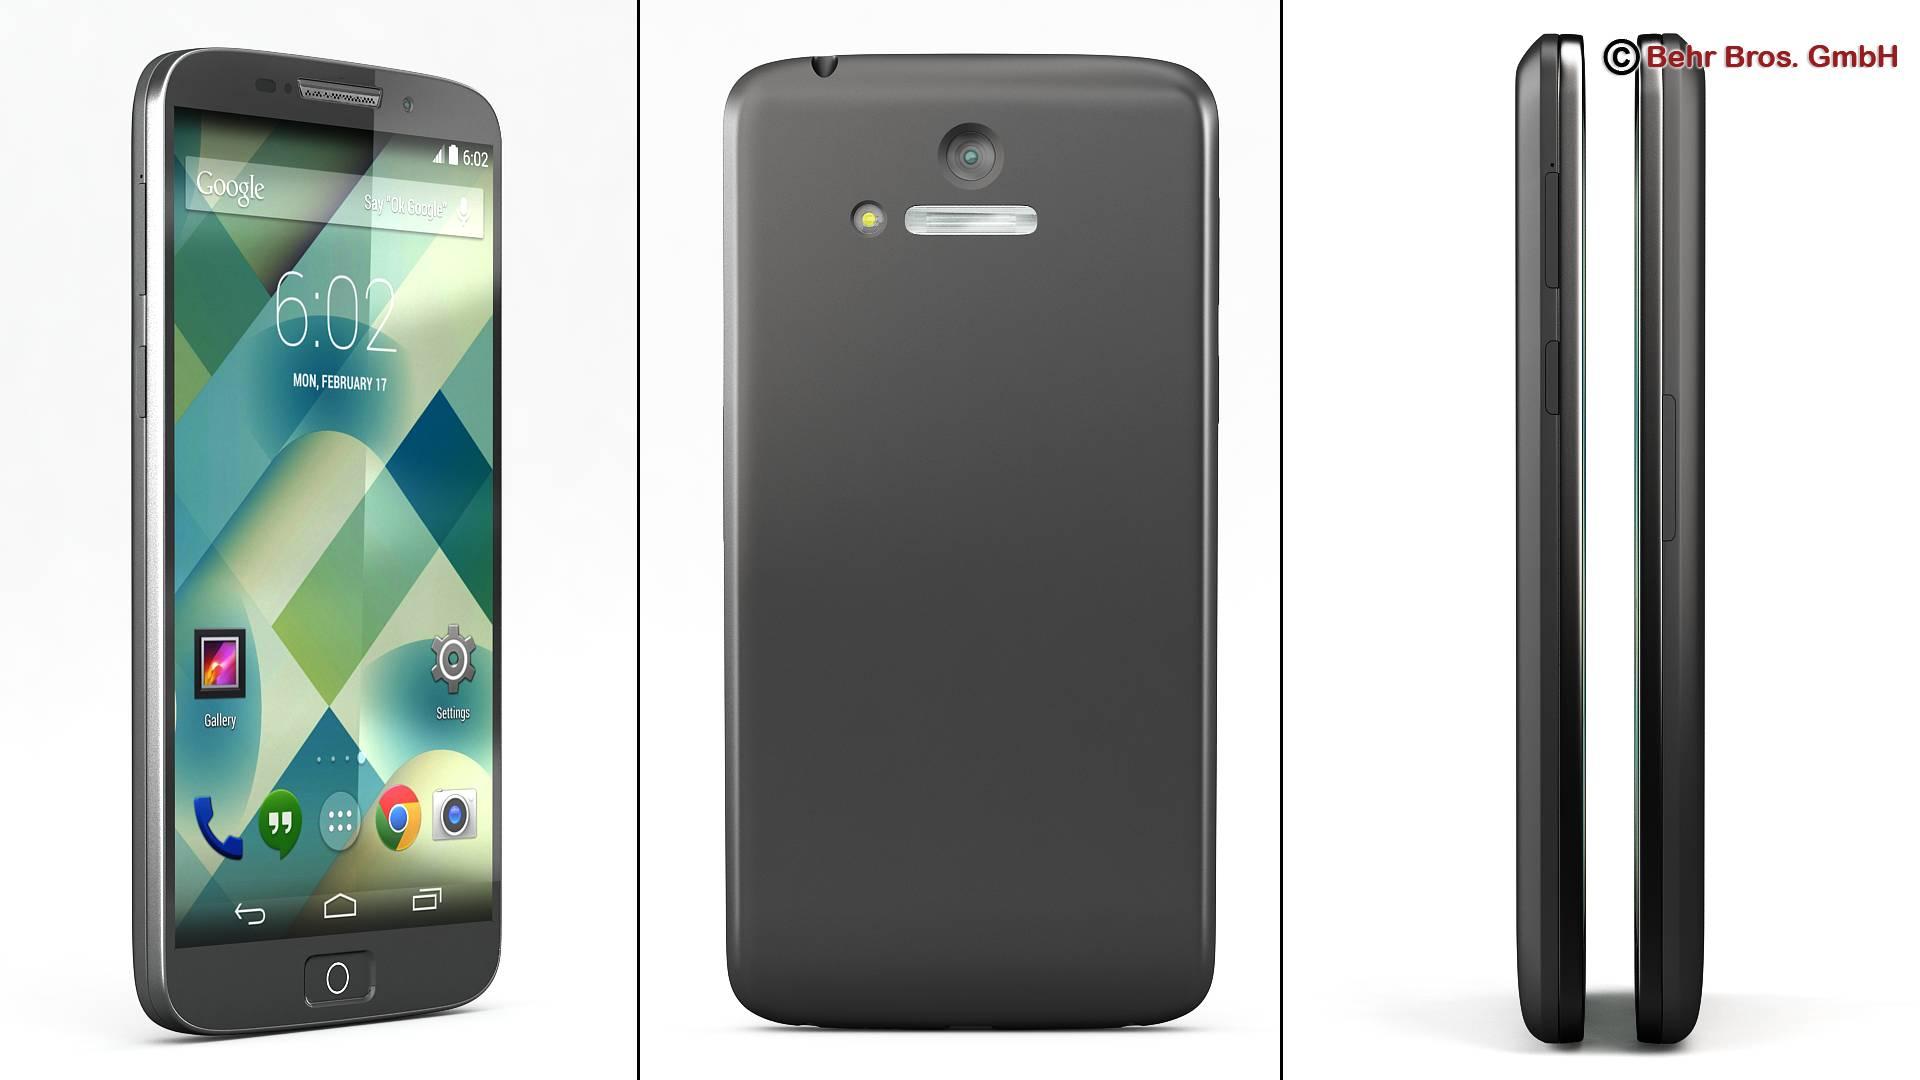 generic smartphone 5.2 inch 3d model 3ds max fbx c4d lwo ma mb obj 161647